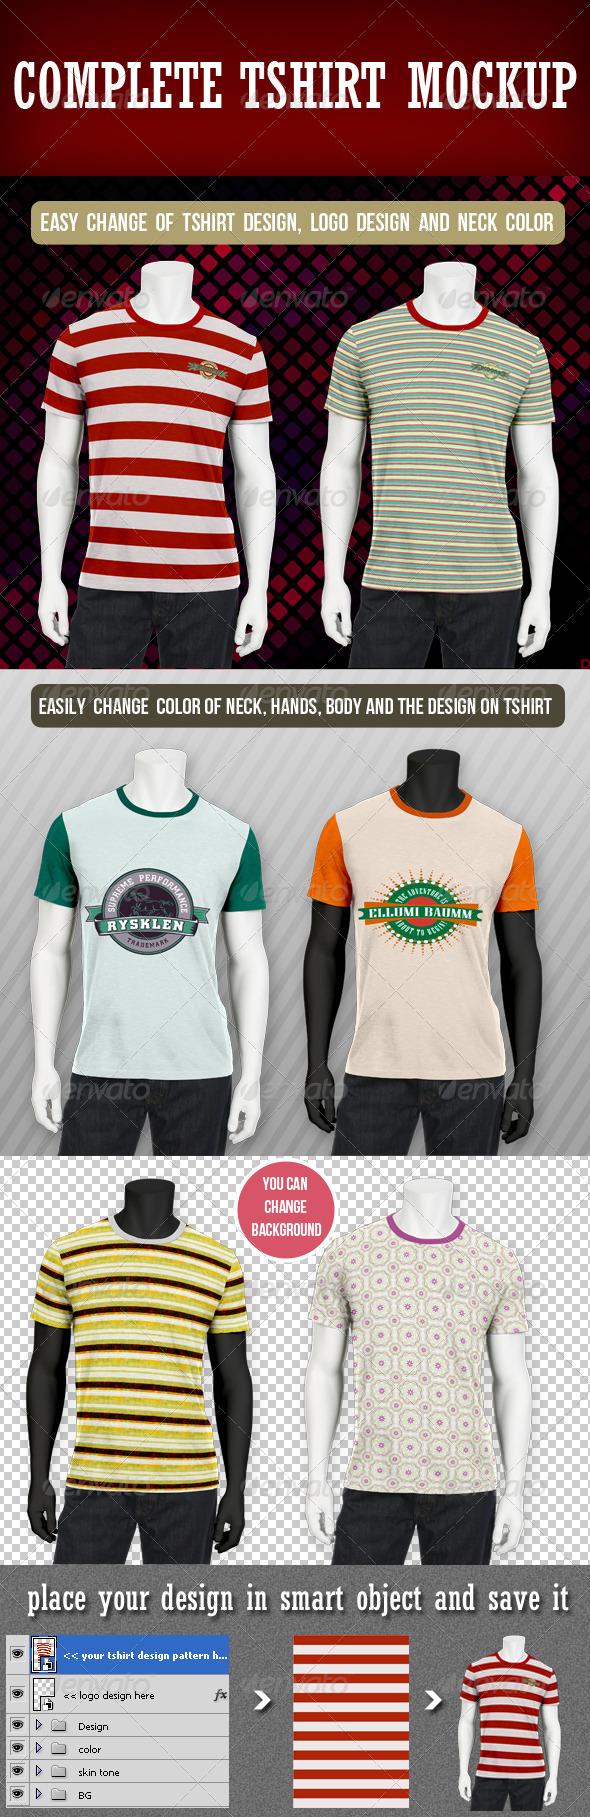 GraphicRiver Complete T-shirt Mockup 3153063